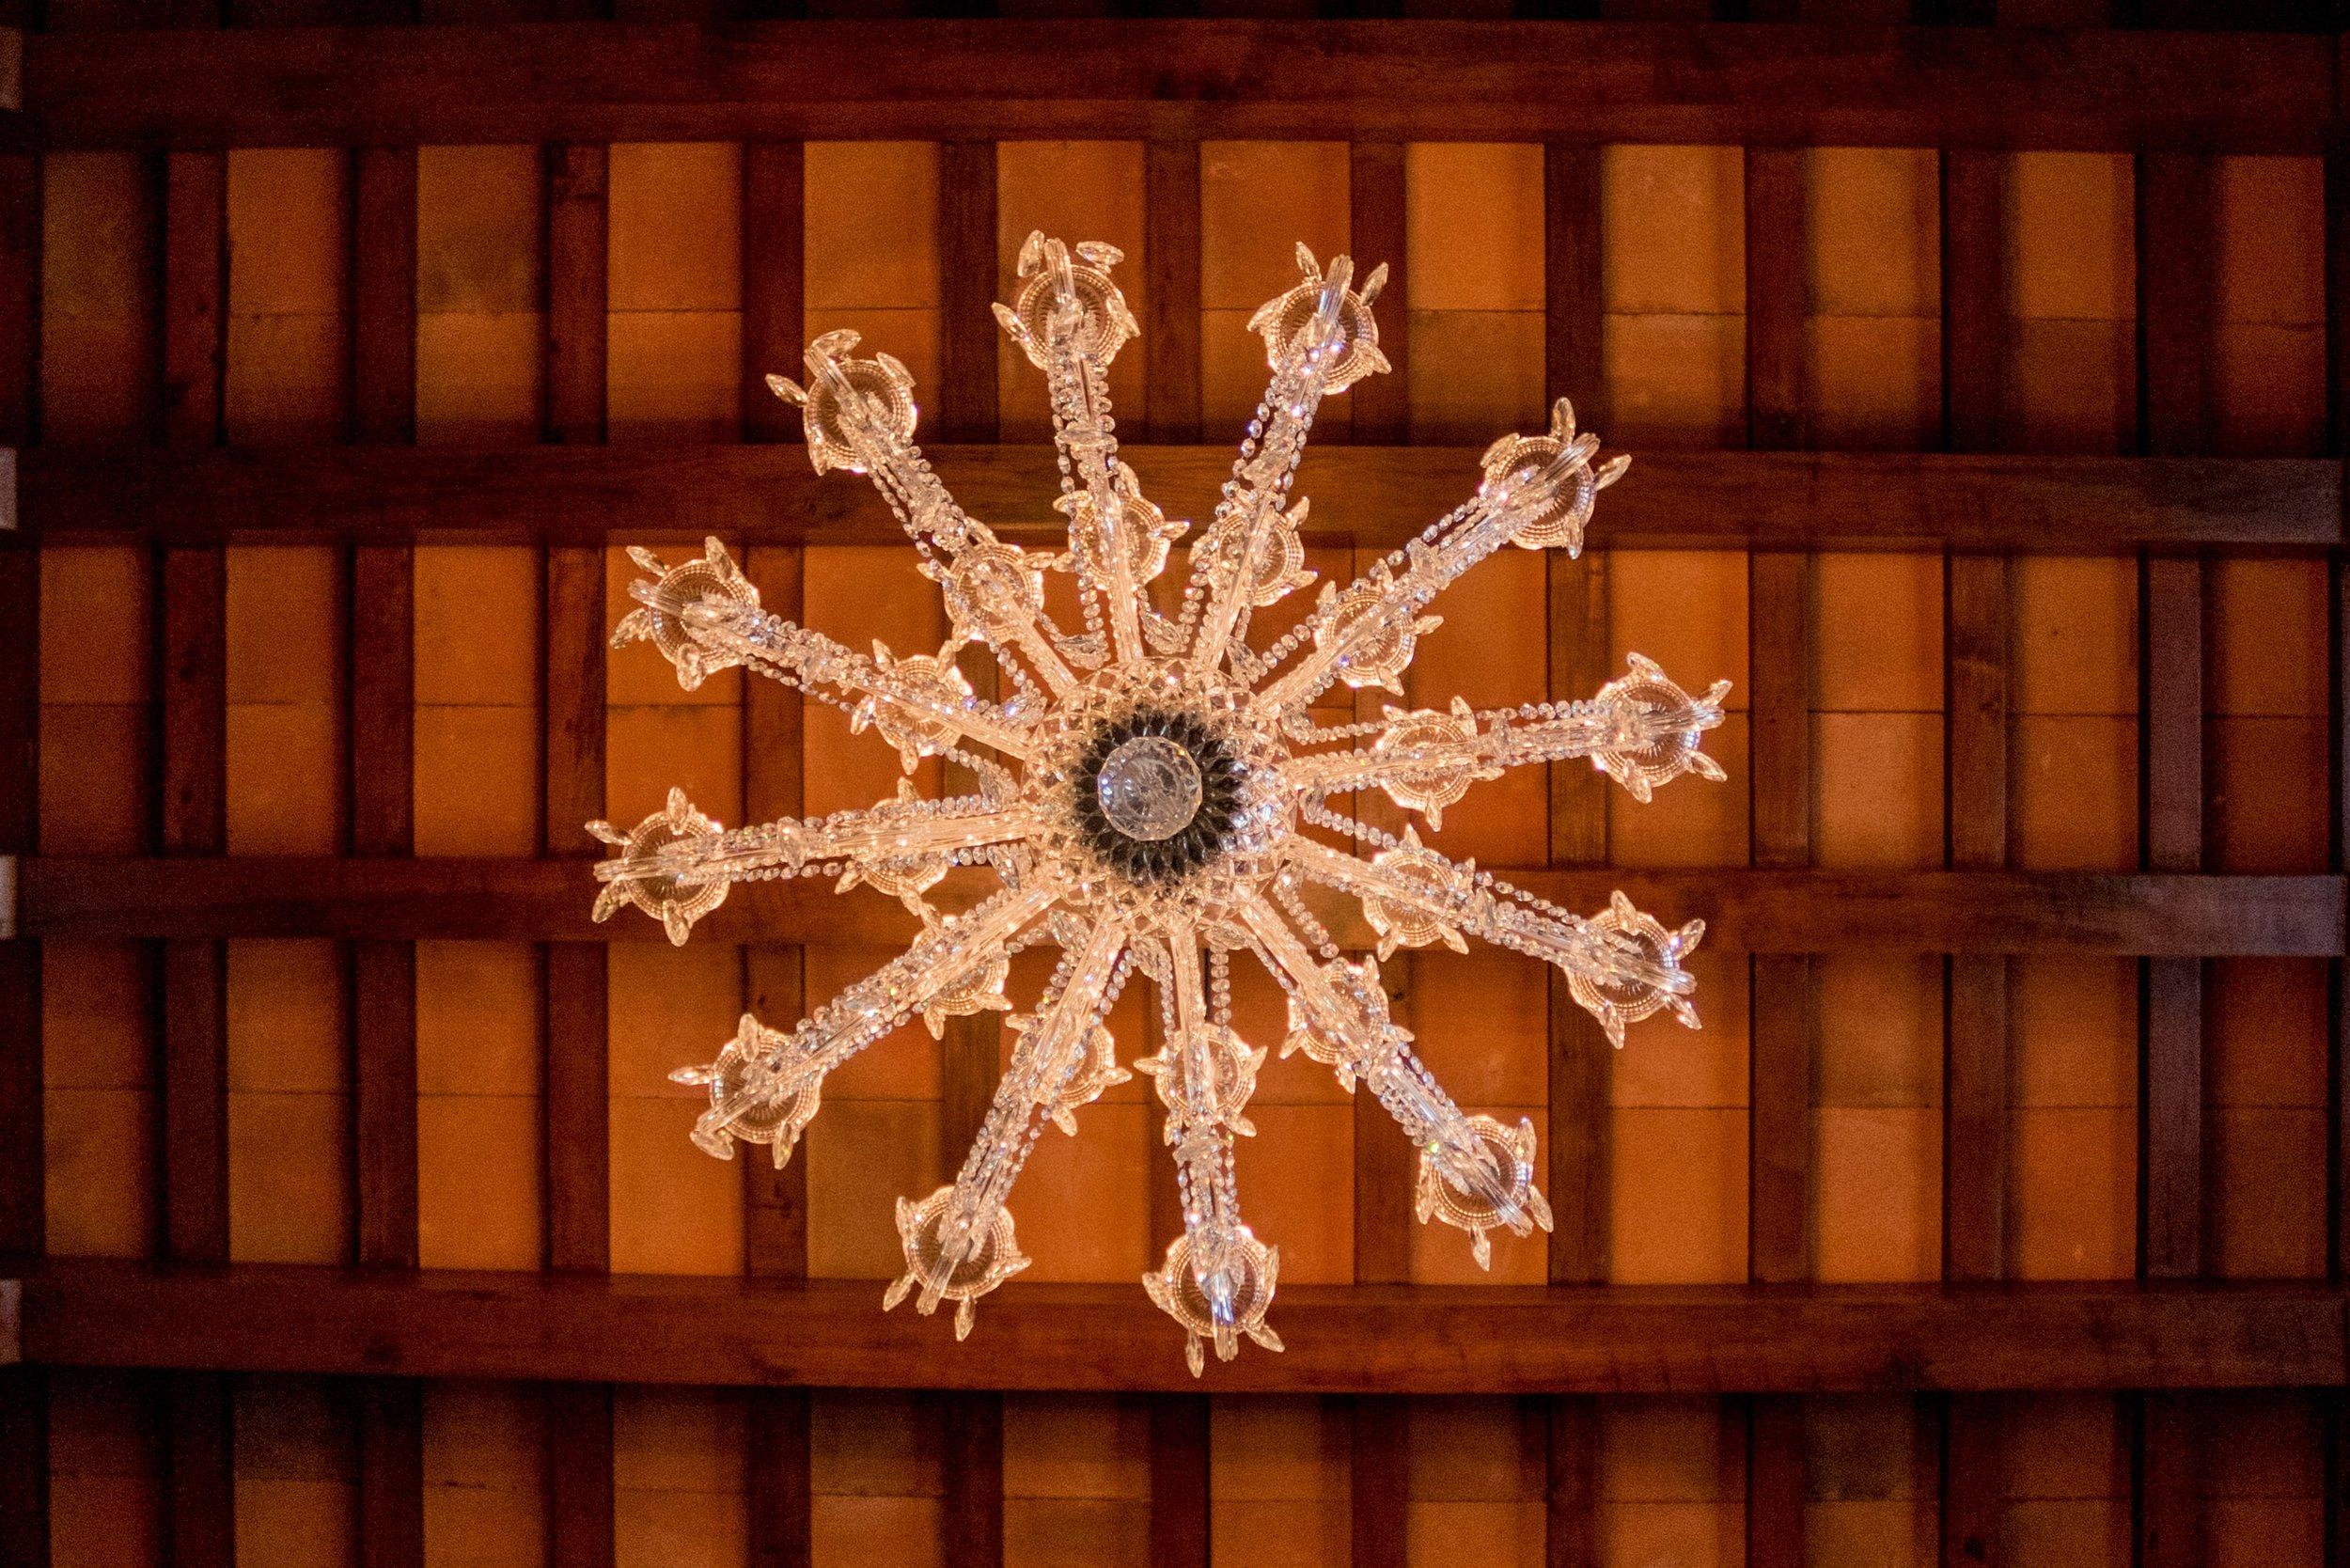 Diamant 24 v interiéru (2) -min.jpeg